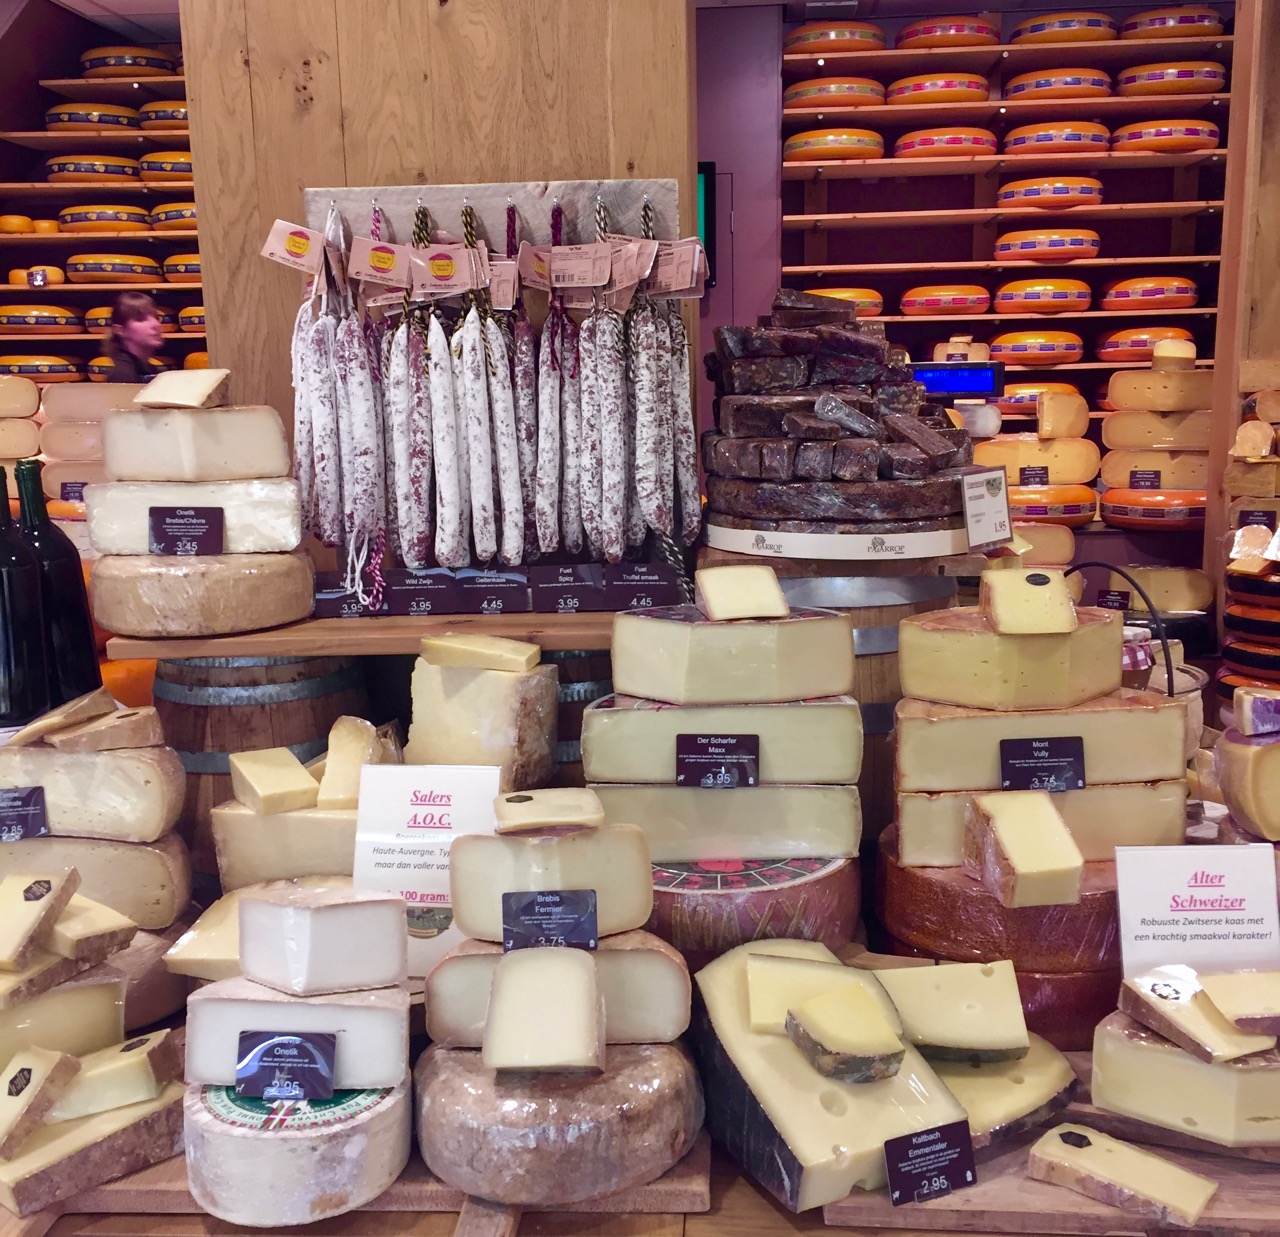 Hague tasting cheese